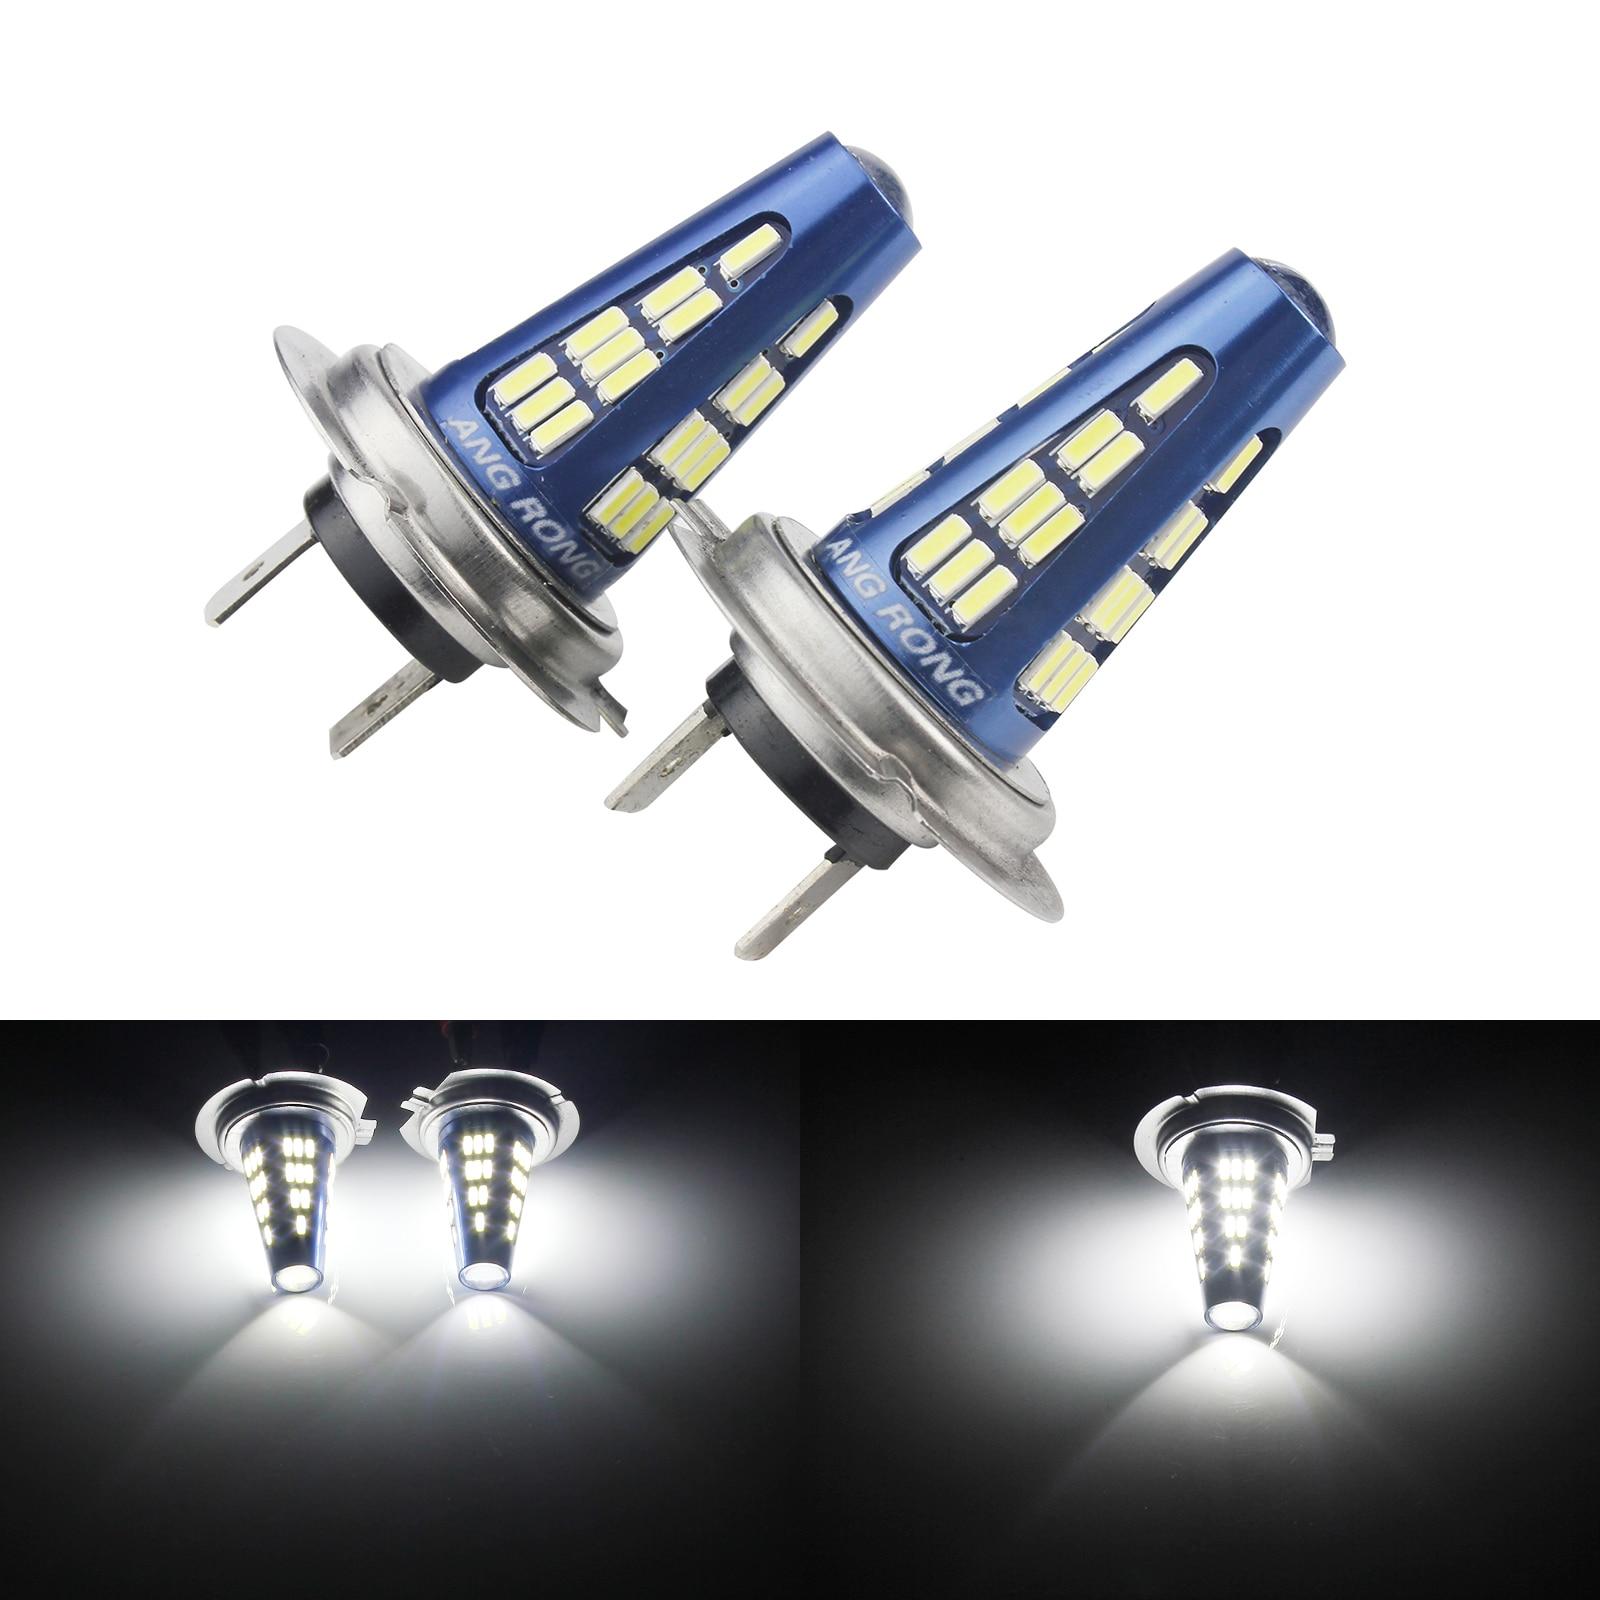 Fits Kia Pride White LED /'Trade/' Wide Angle Side Light Beam Bulbs Pair Upgrade